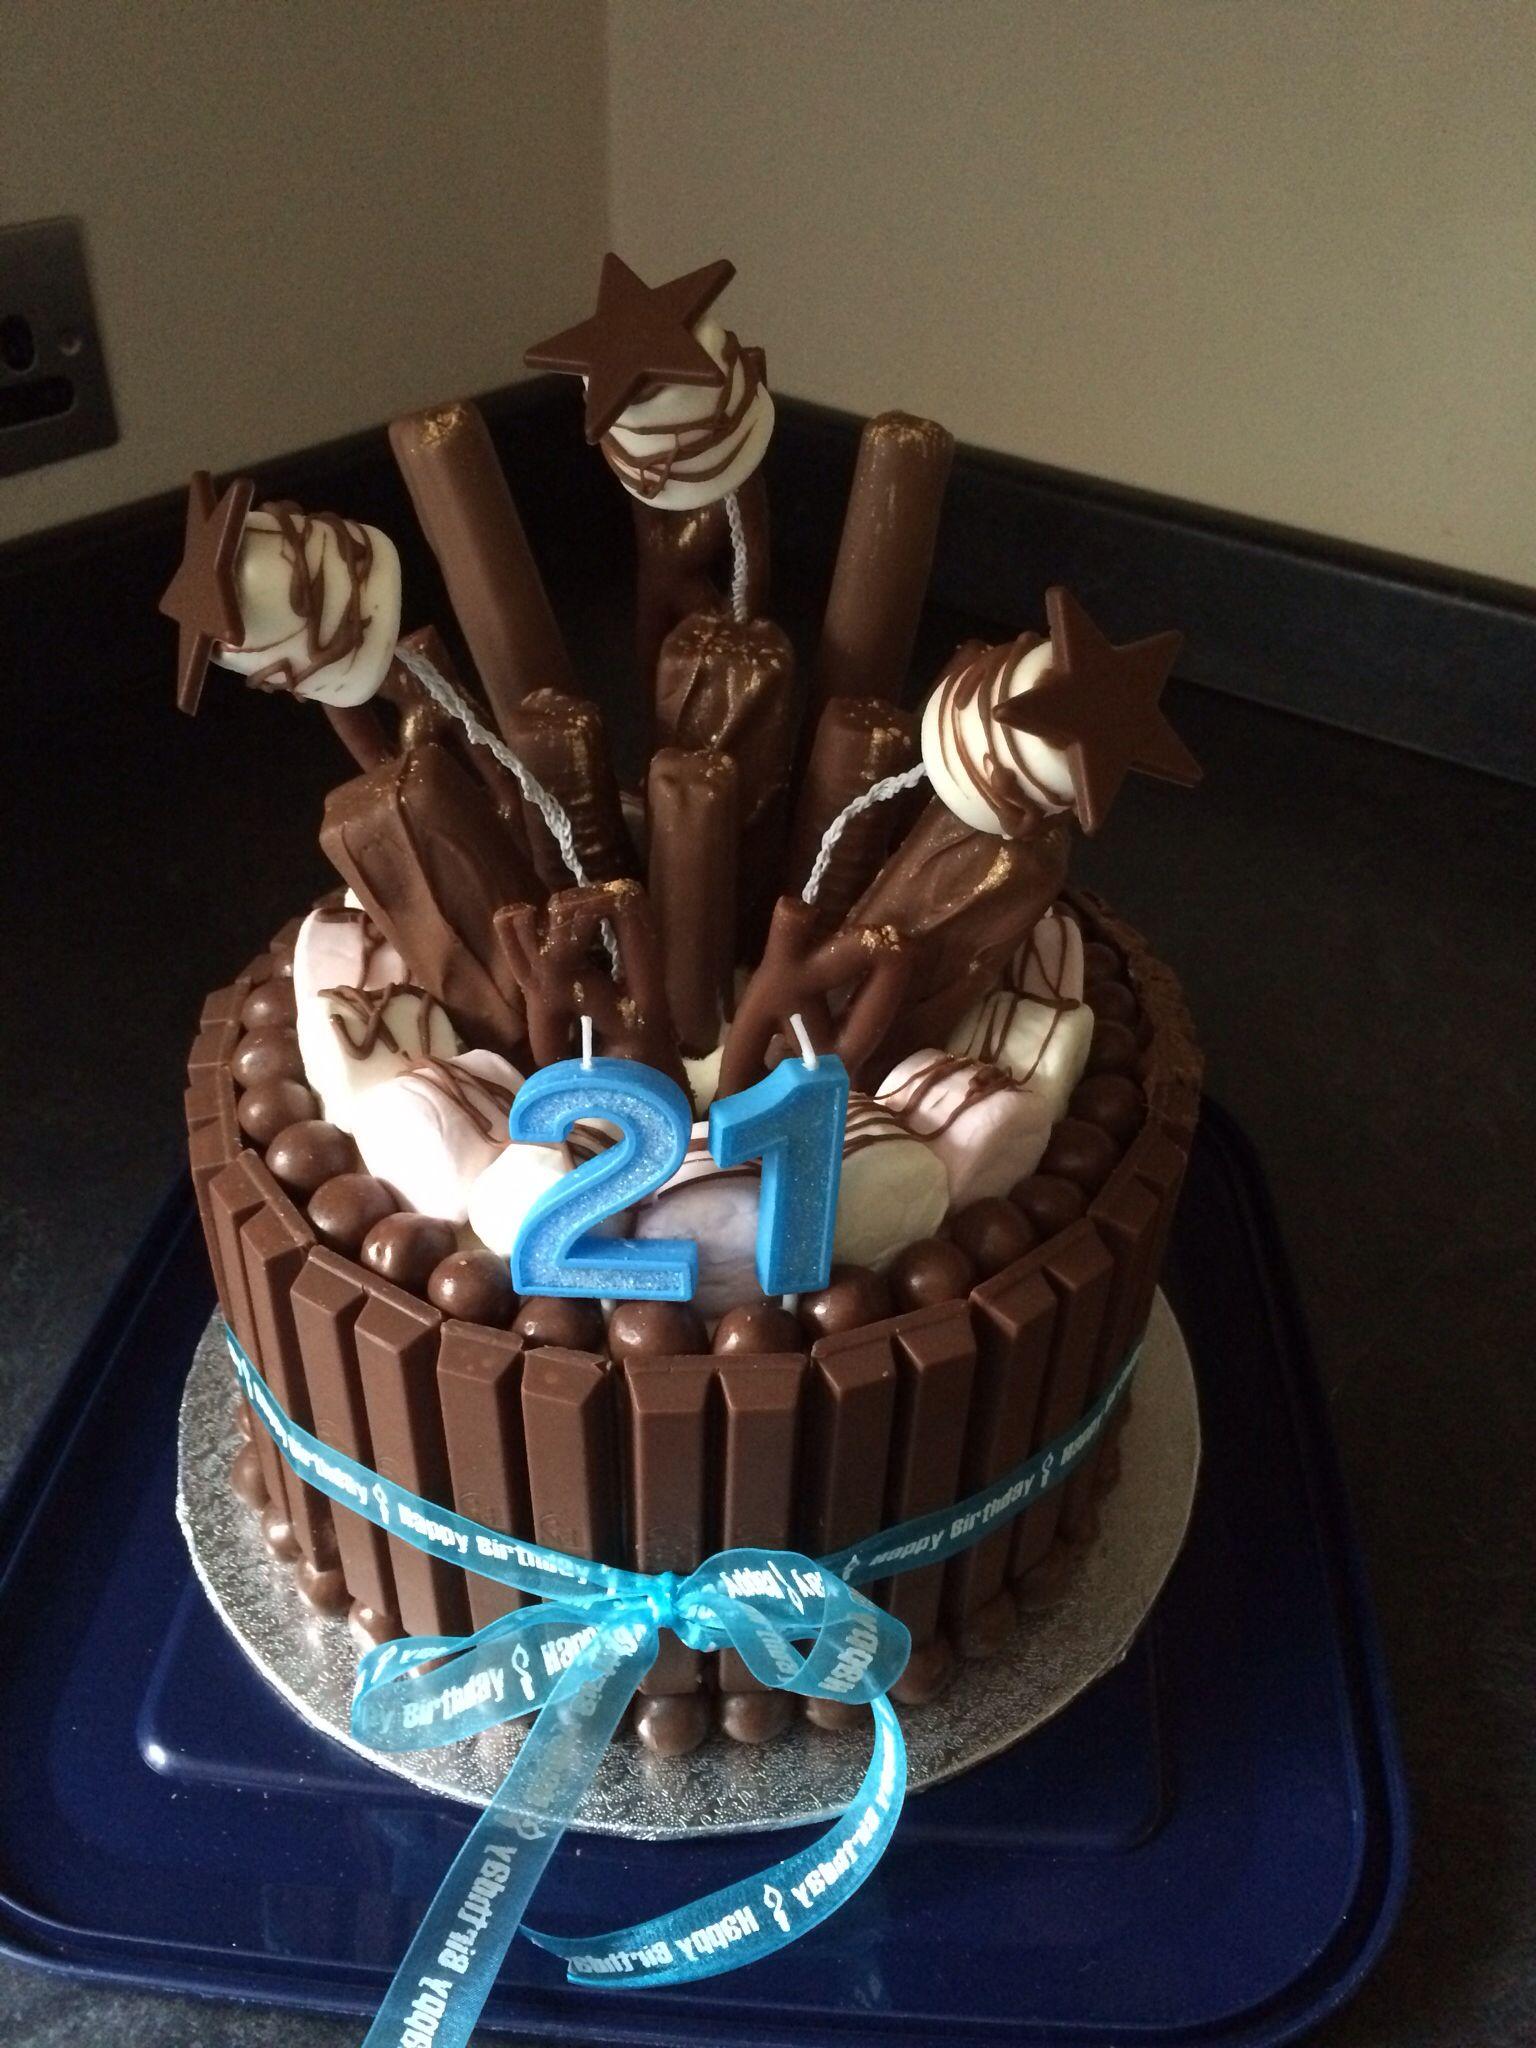 Tom S 21st Birthday Chocolate Explosion Cake